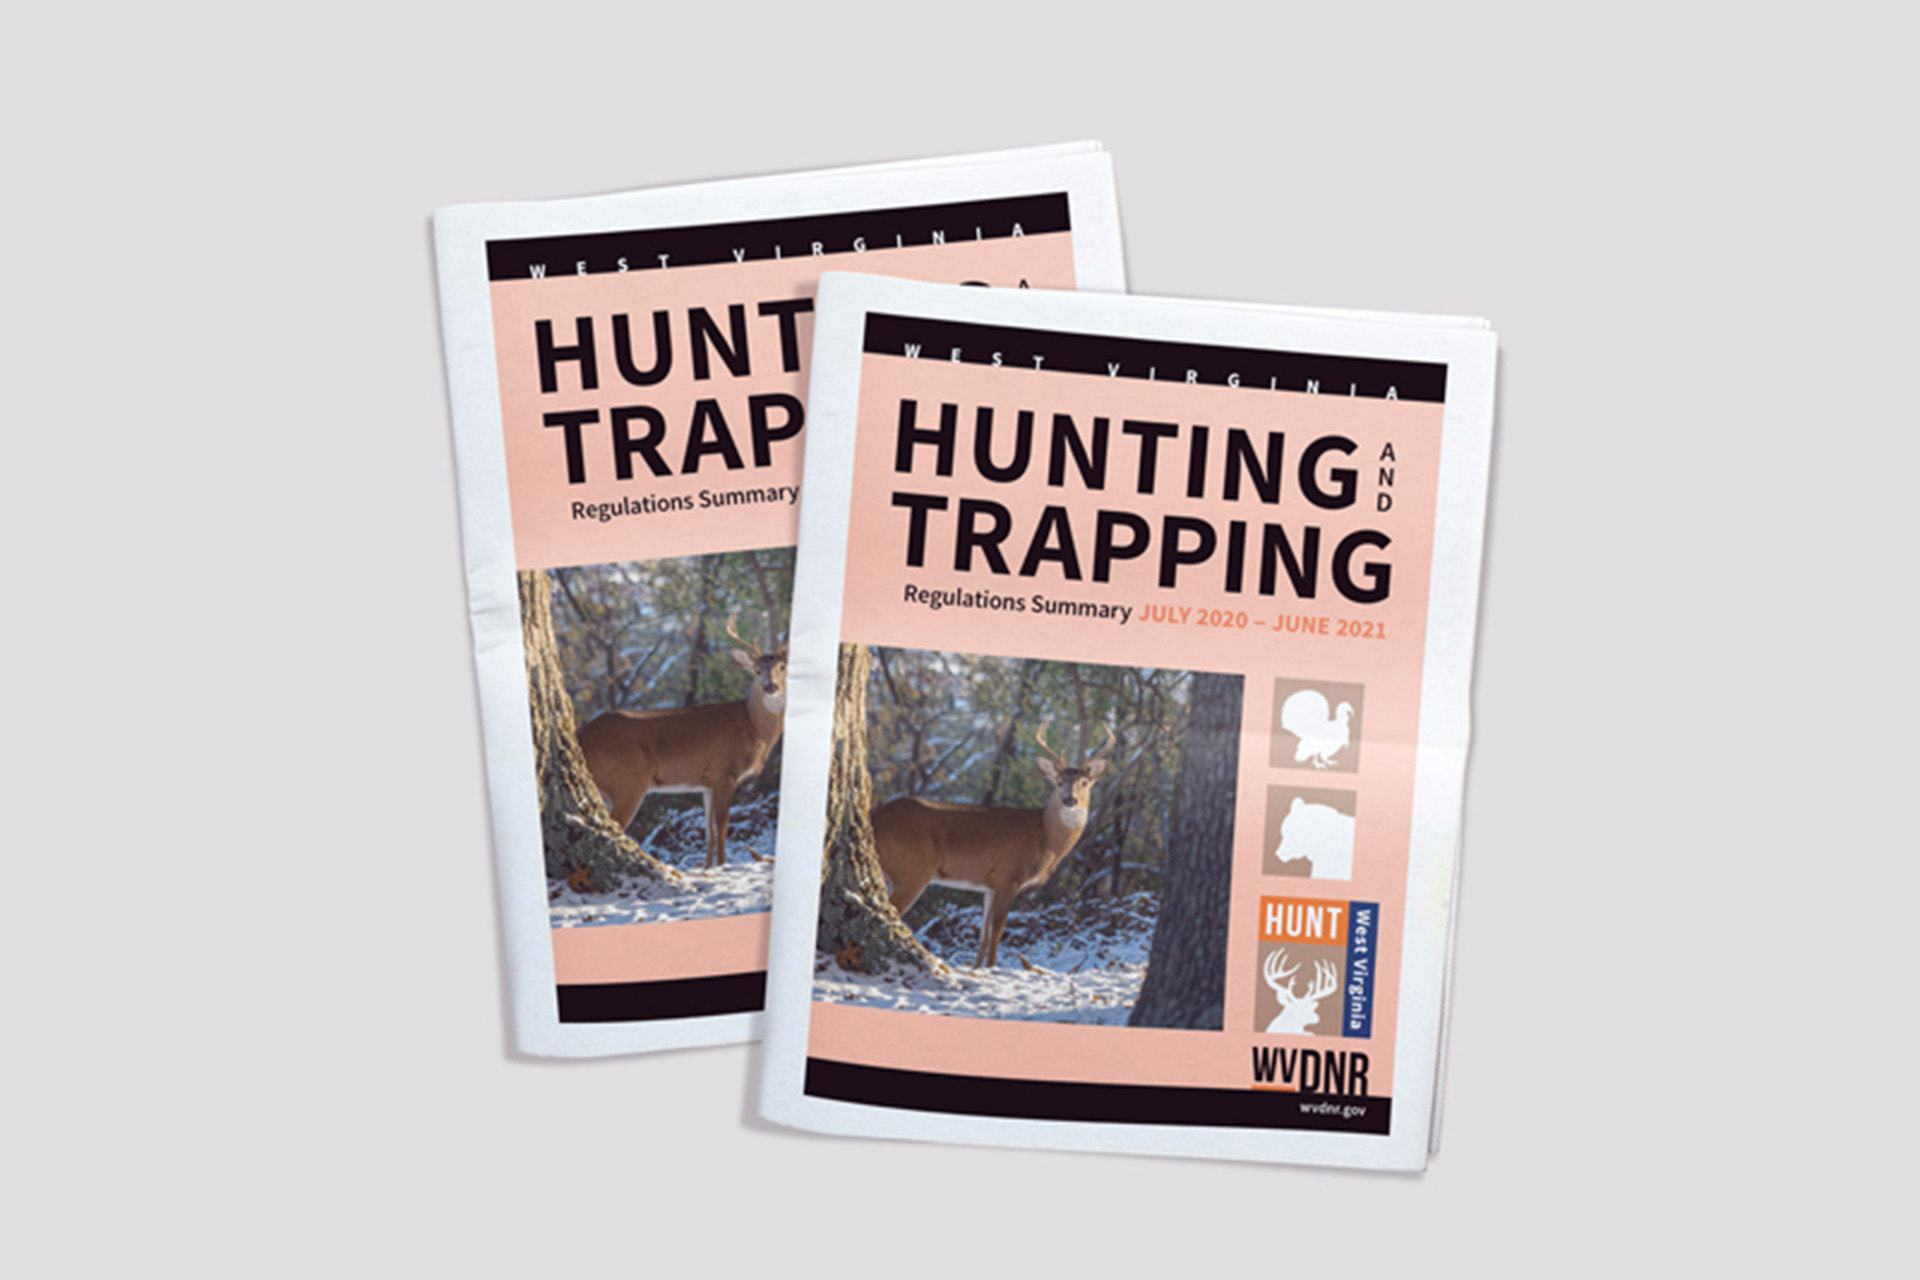 Wvdnr Explains Hunting Season Changes In 2020-2021 Hunting